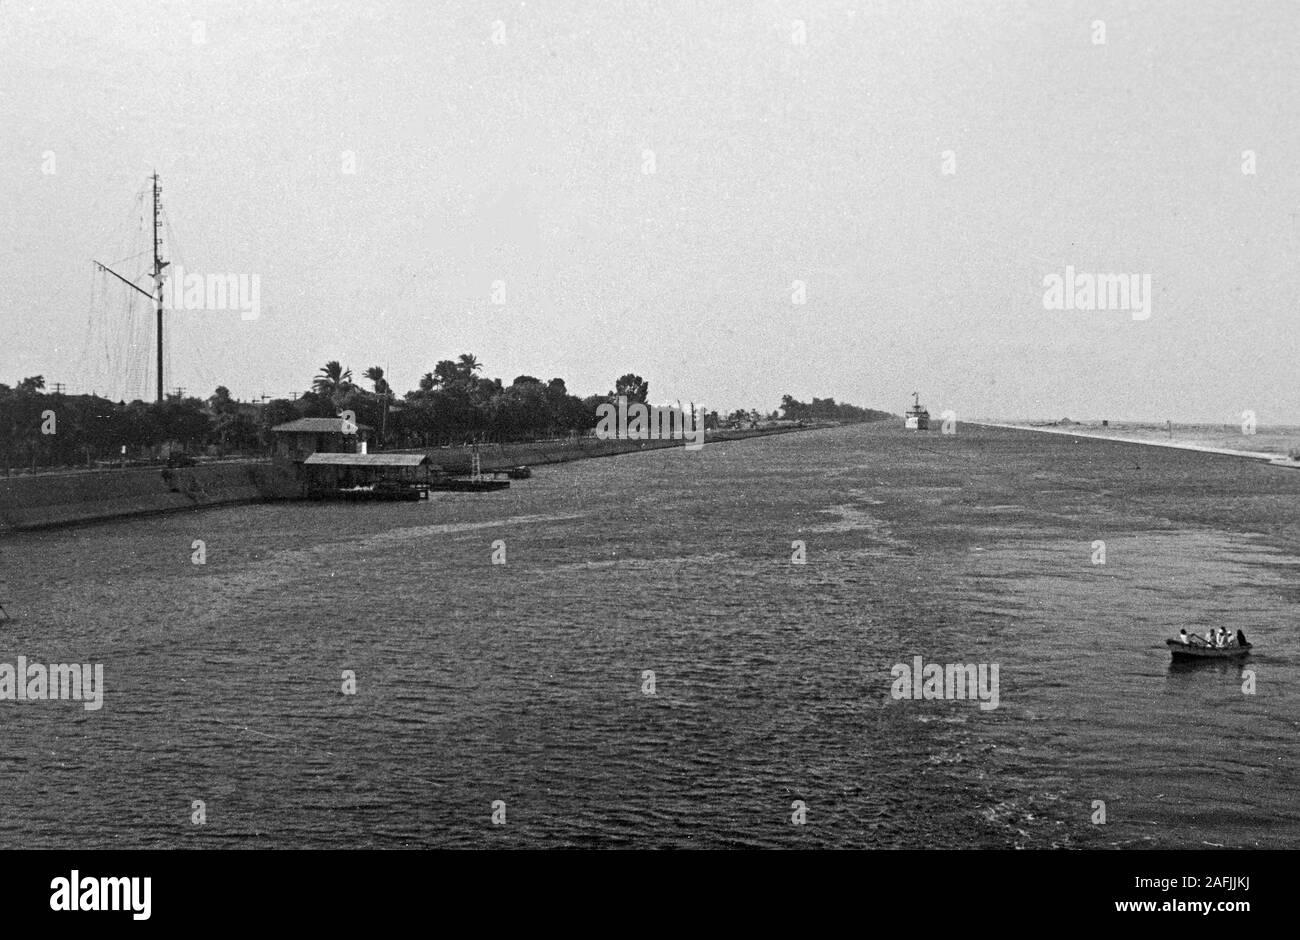 Der Suez Kanal bei Port Said, 1955. Suez Canal near Port Said, 1955. Stock Photo